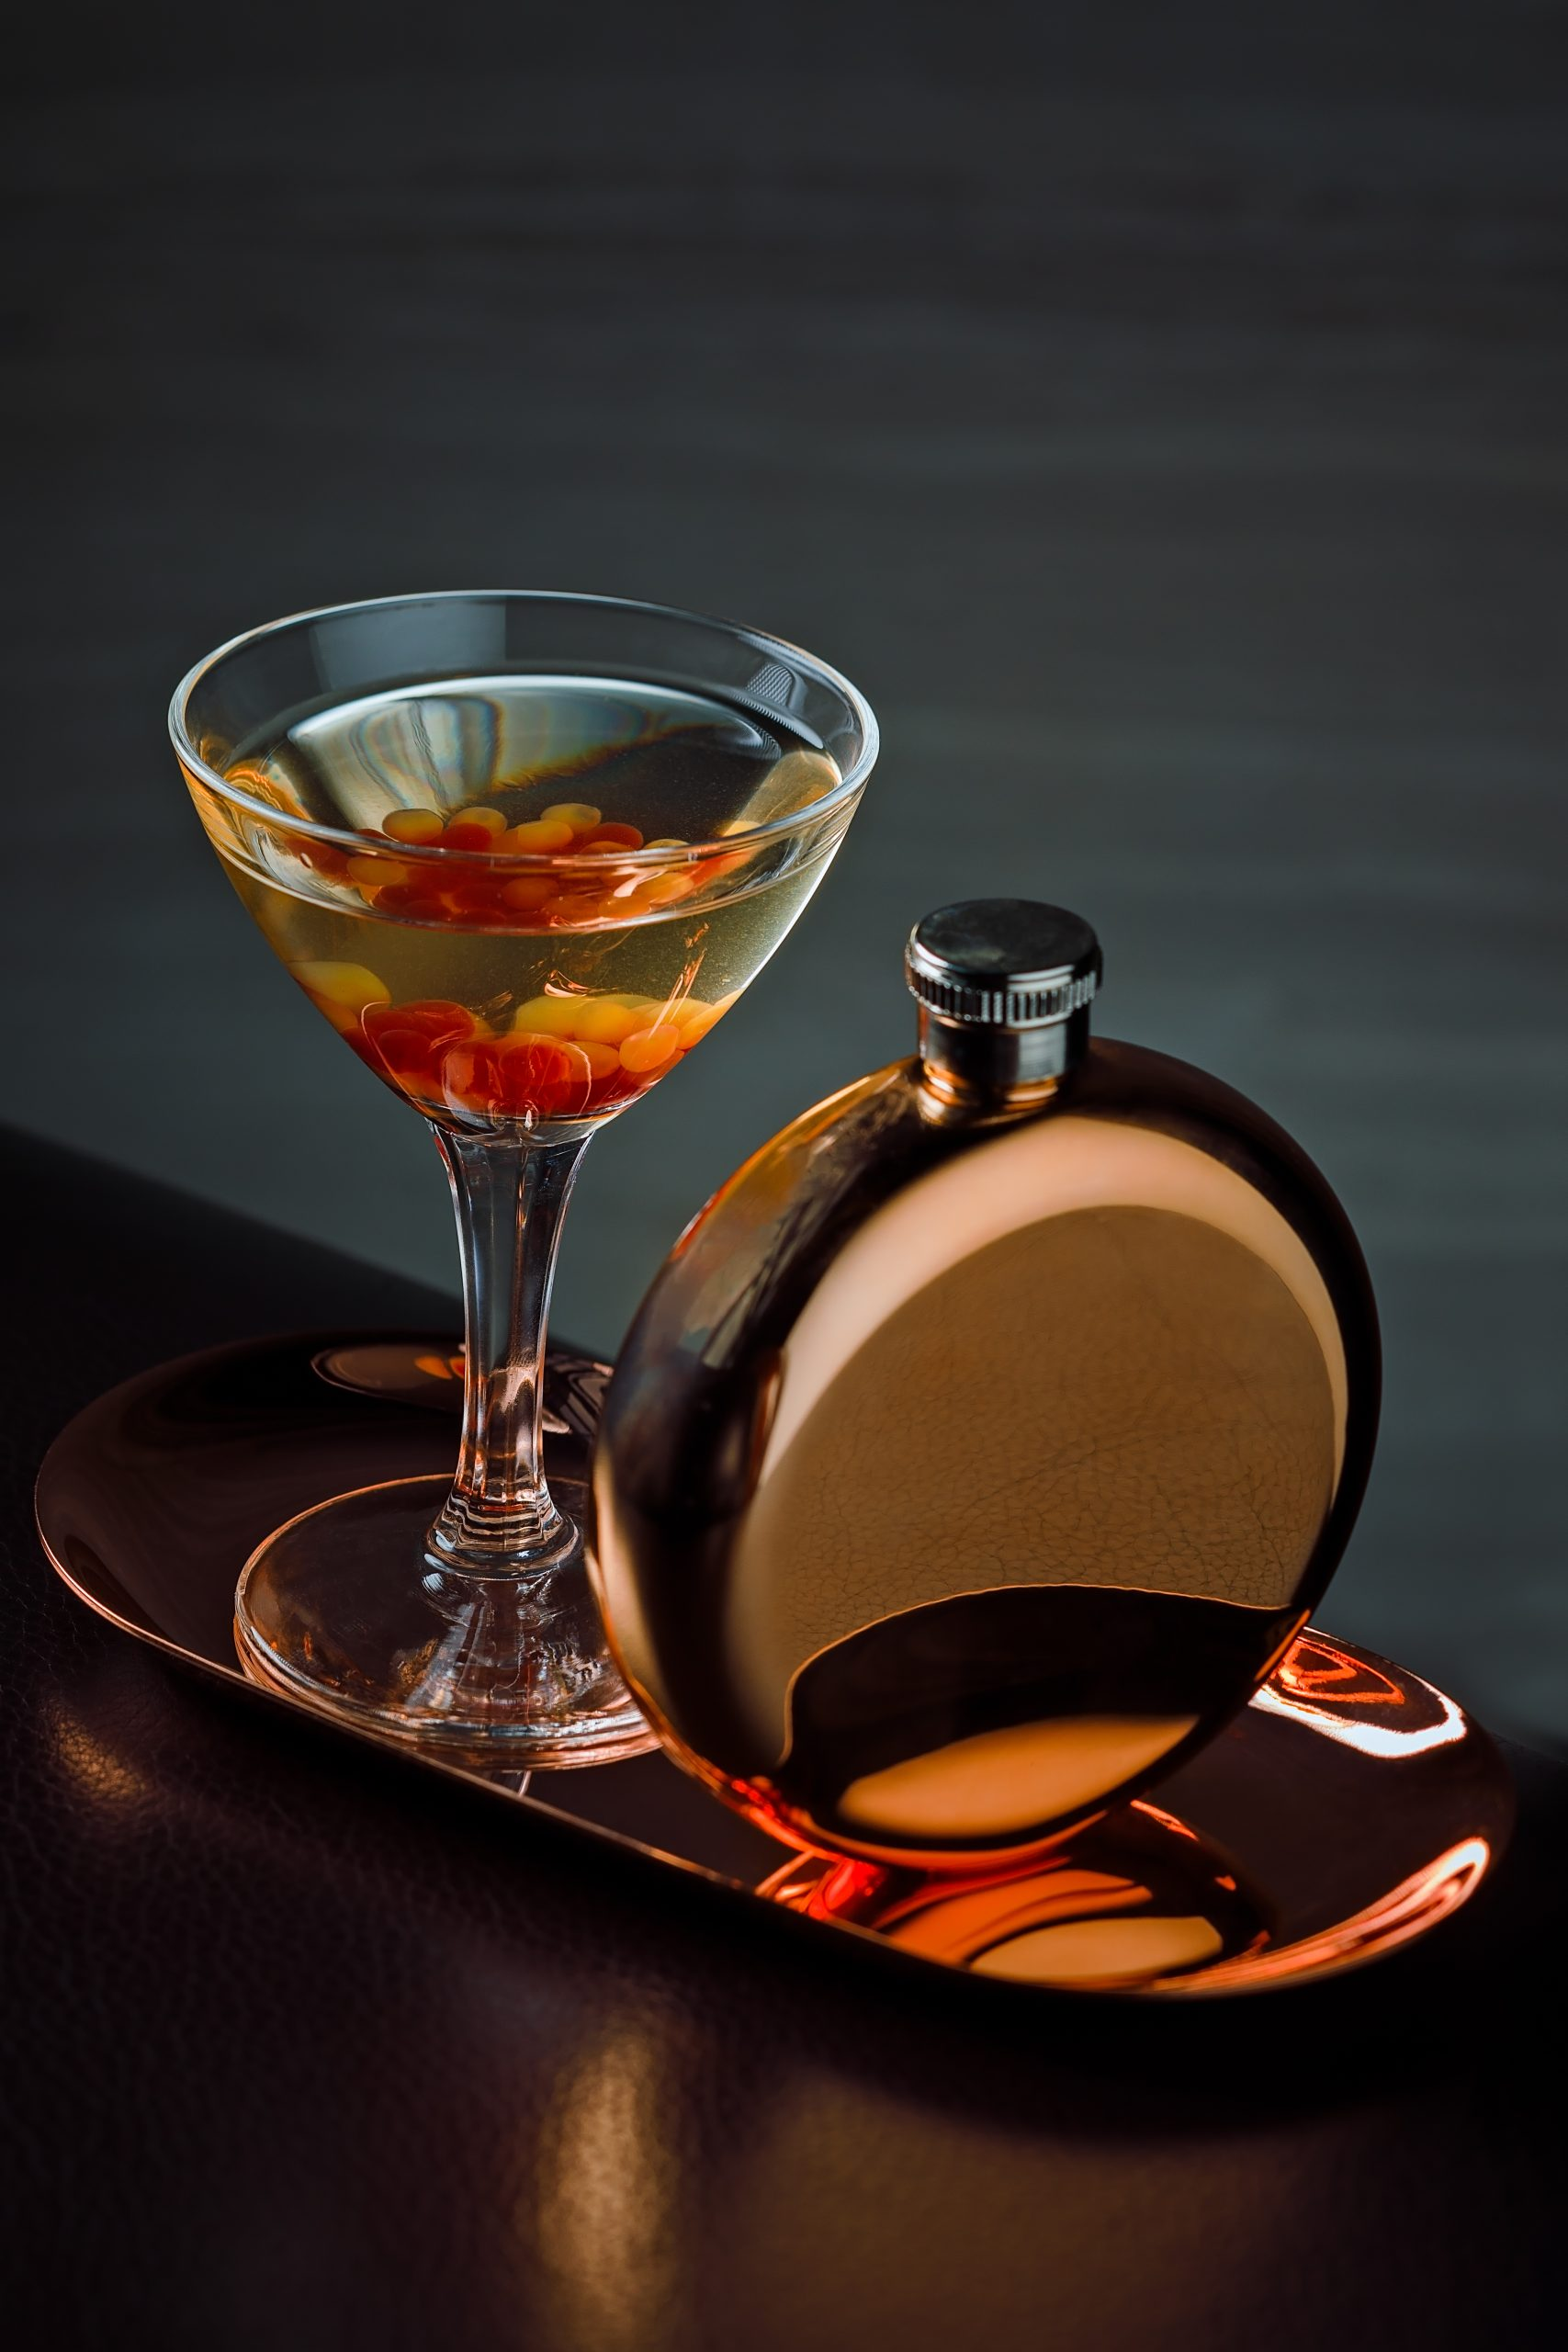 """Gin Sake Margarita"" at Vida Rica Bar, Mandarin Oriental Macau - Photo courtesy of Mandarin Oriental Macau"